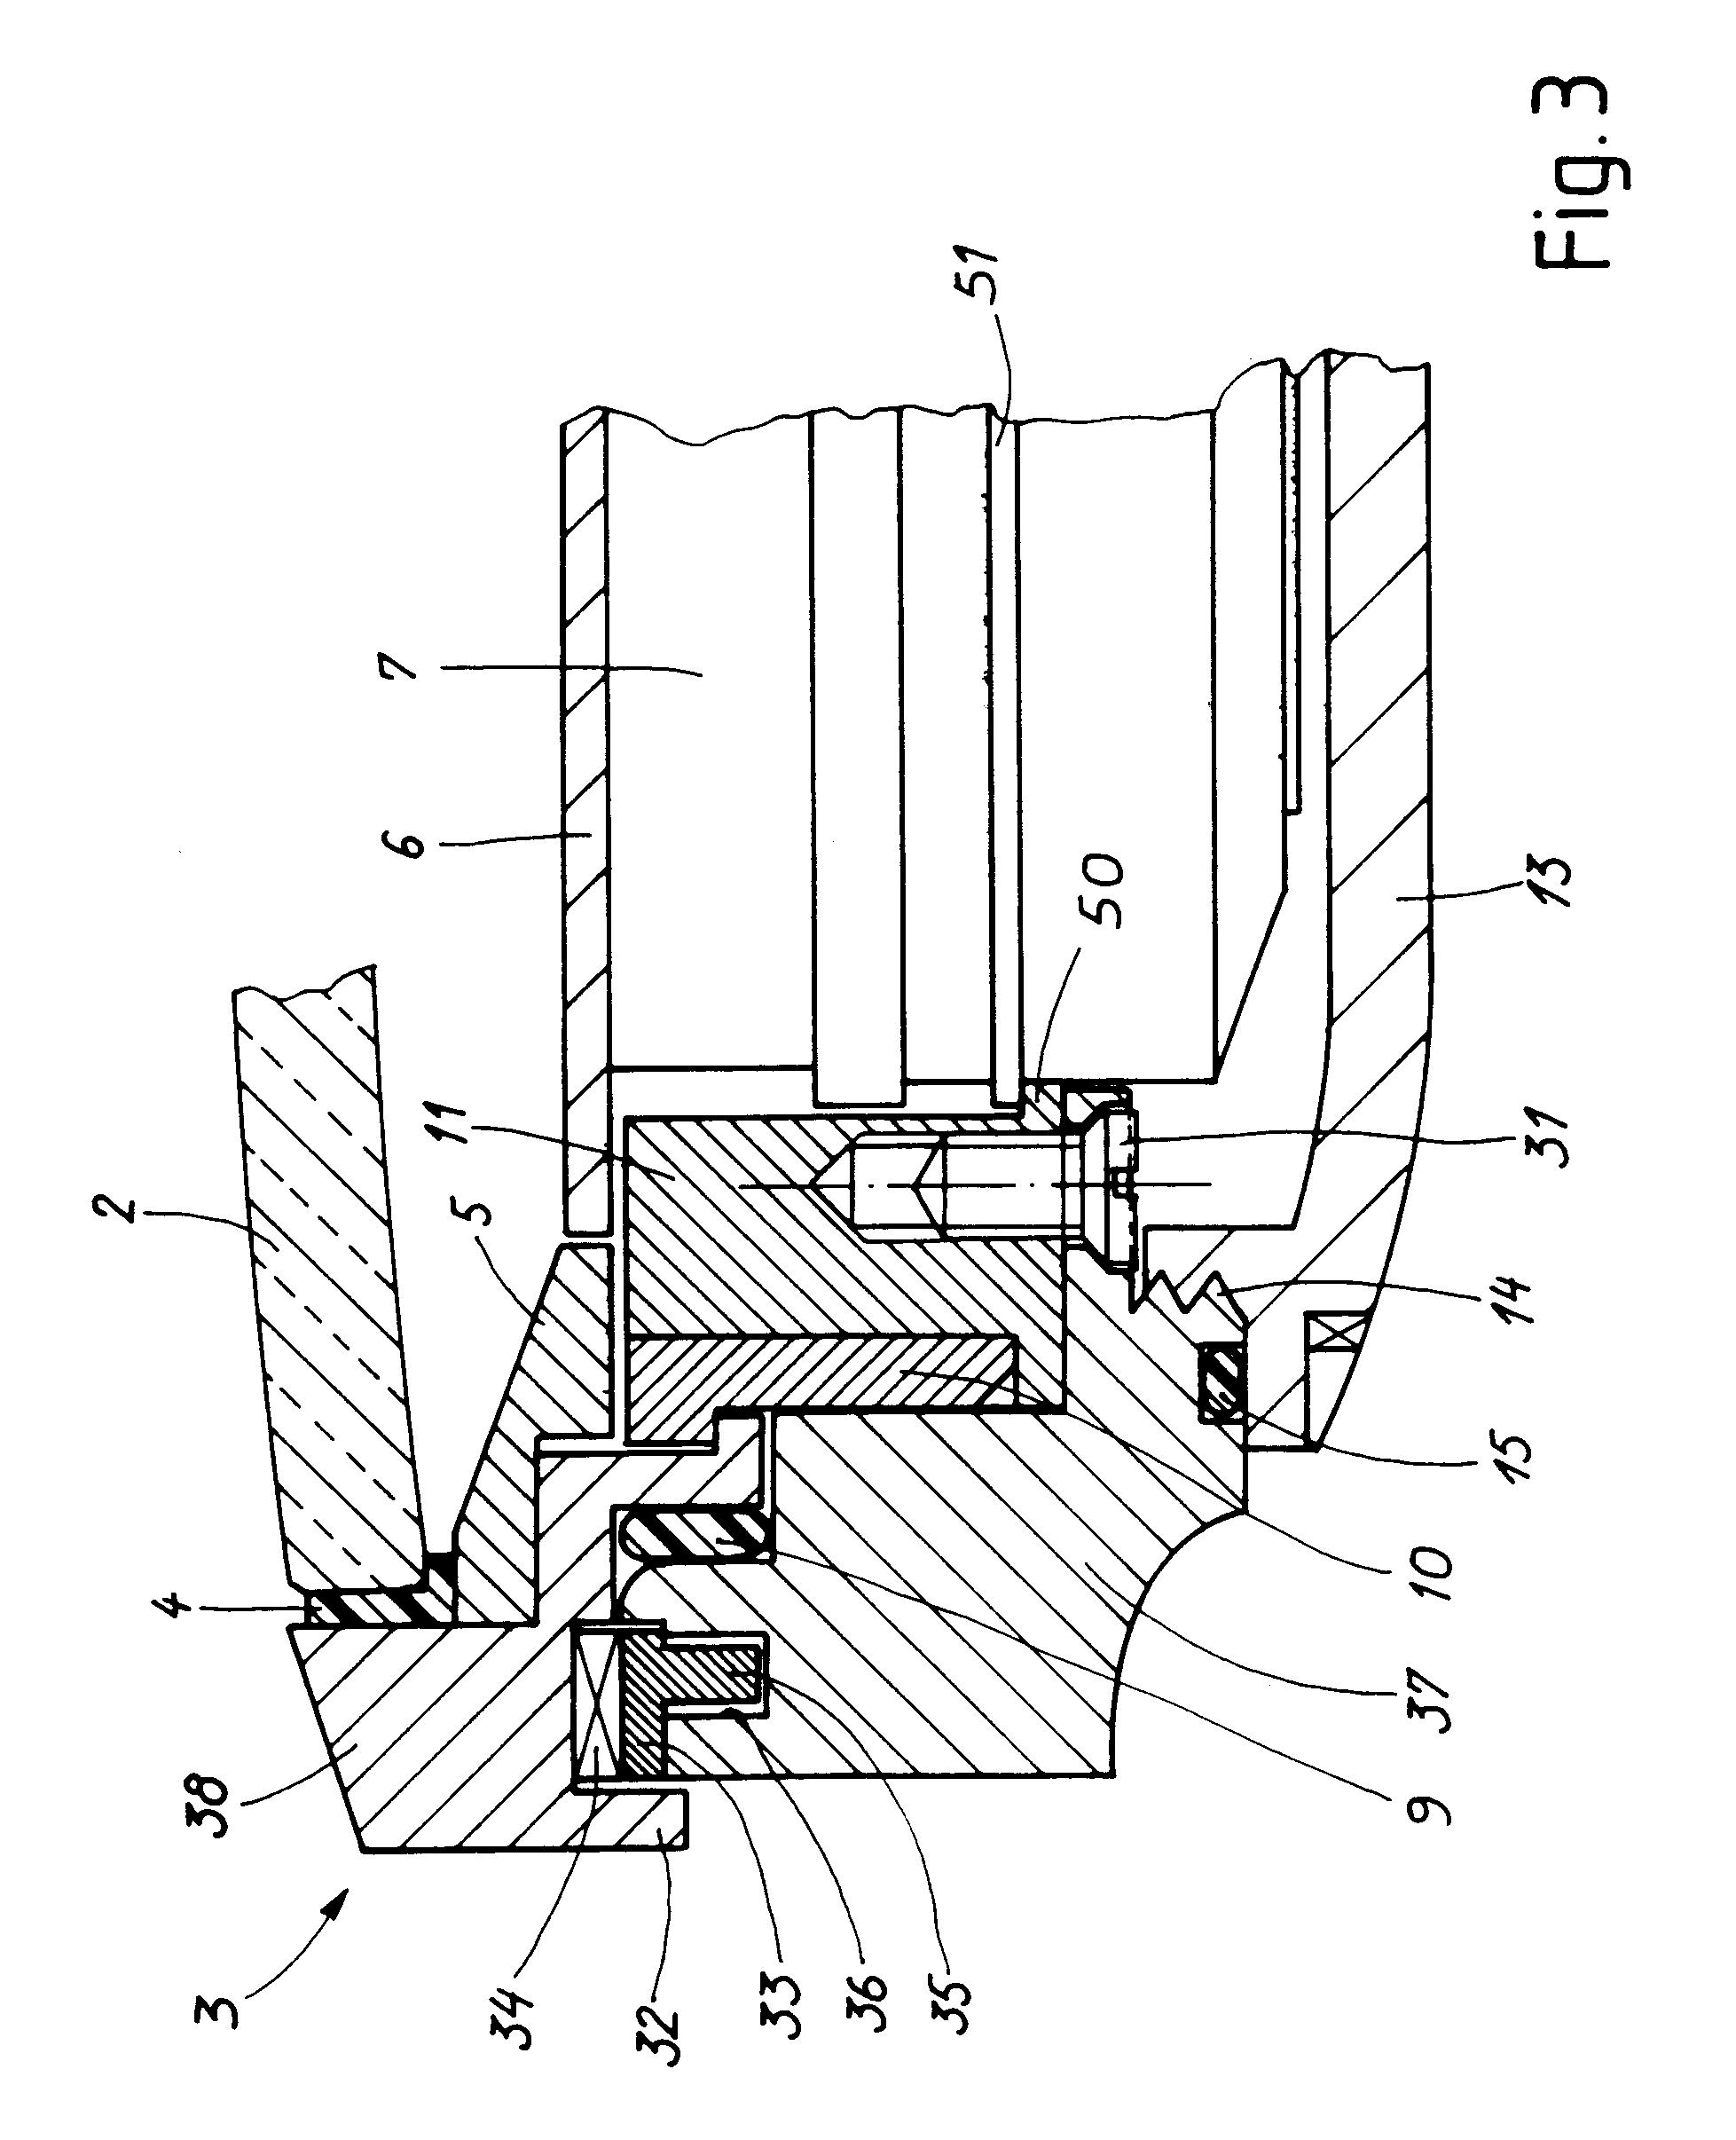 Fine C3 Corvette Spark Plug Wire Routing Ideas - Electrical Diagram ...